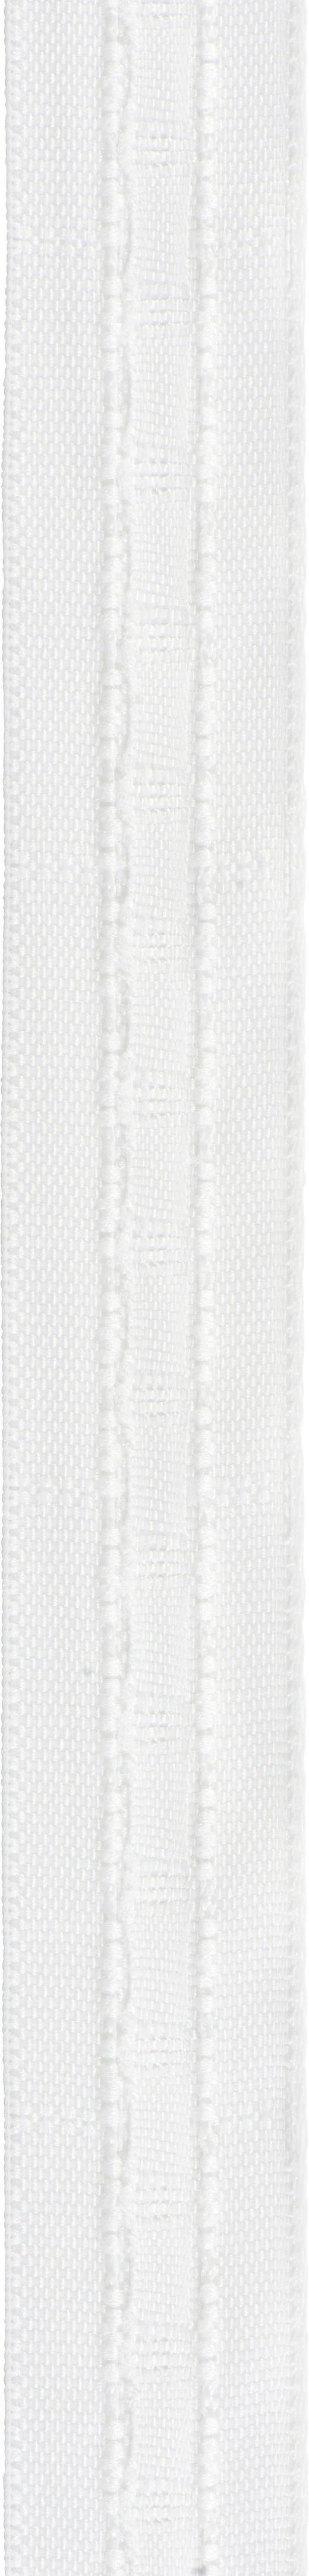 KRÄUSELBAND - Weiß, Basics, Textil (2.3//cm)